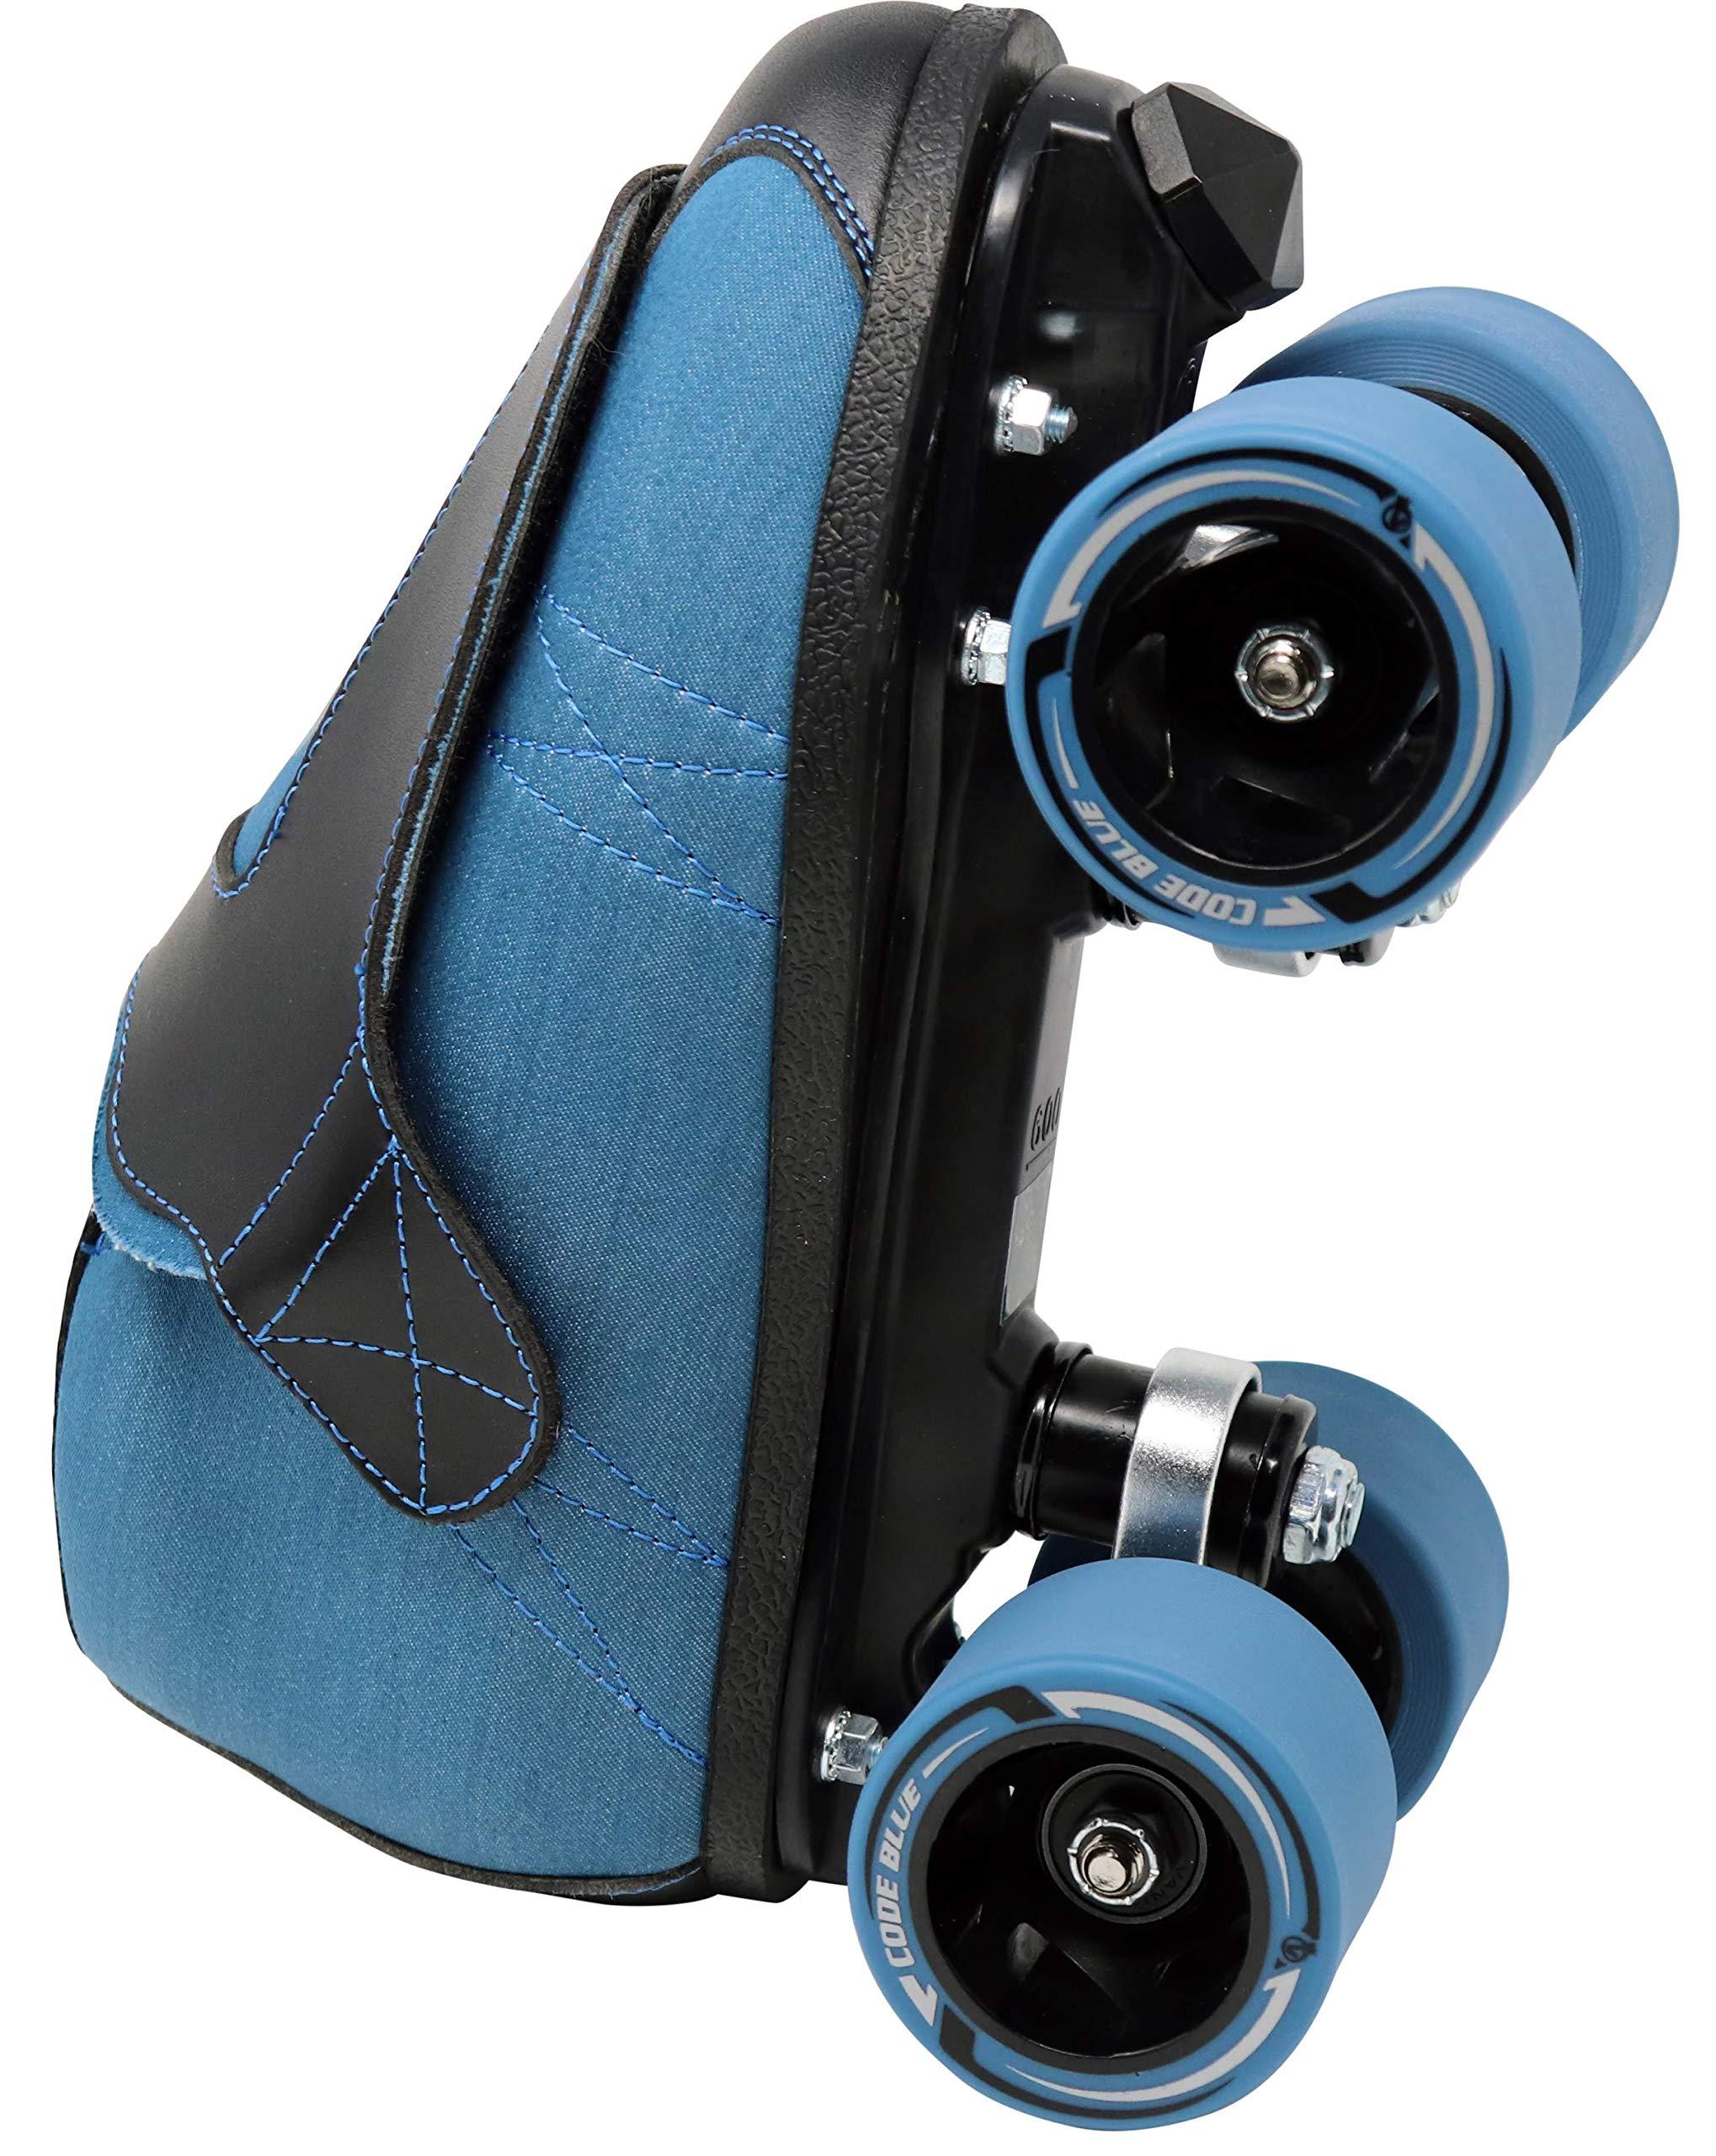 VNLA Code Blue Jam Skate - Mens & Womens Speed Skates - Quad Skates for Women & Men - Adjustable Roller Skate/Rollerskates - Outdoor & Indoor Adult Quad Skate - Kid/Kids Roller Skates (Size 6) by VNLA (Image #5)